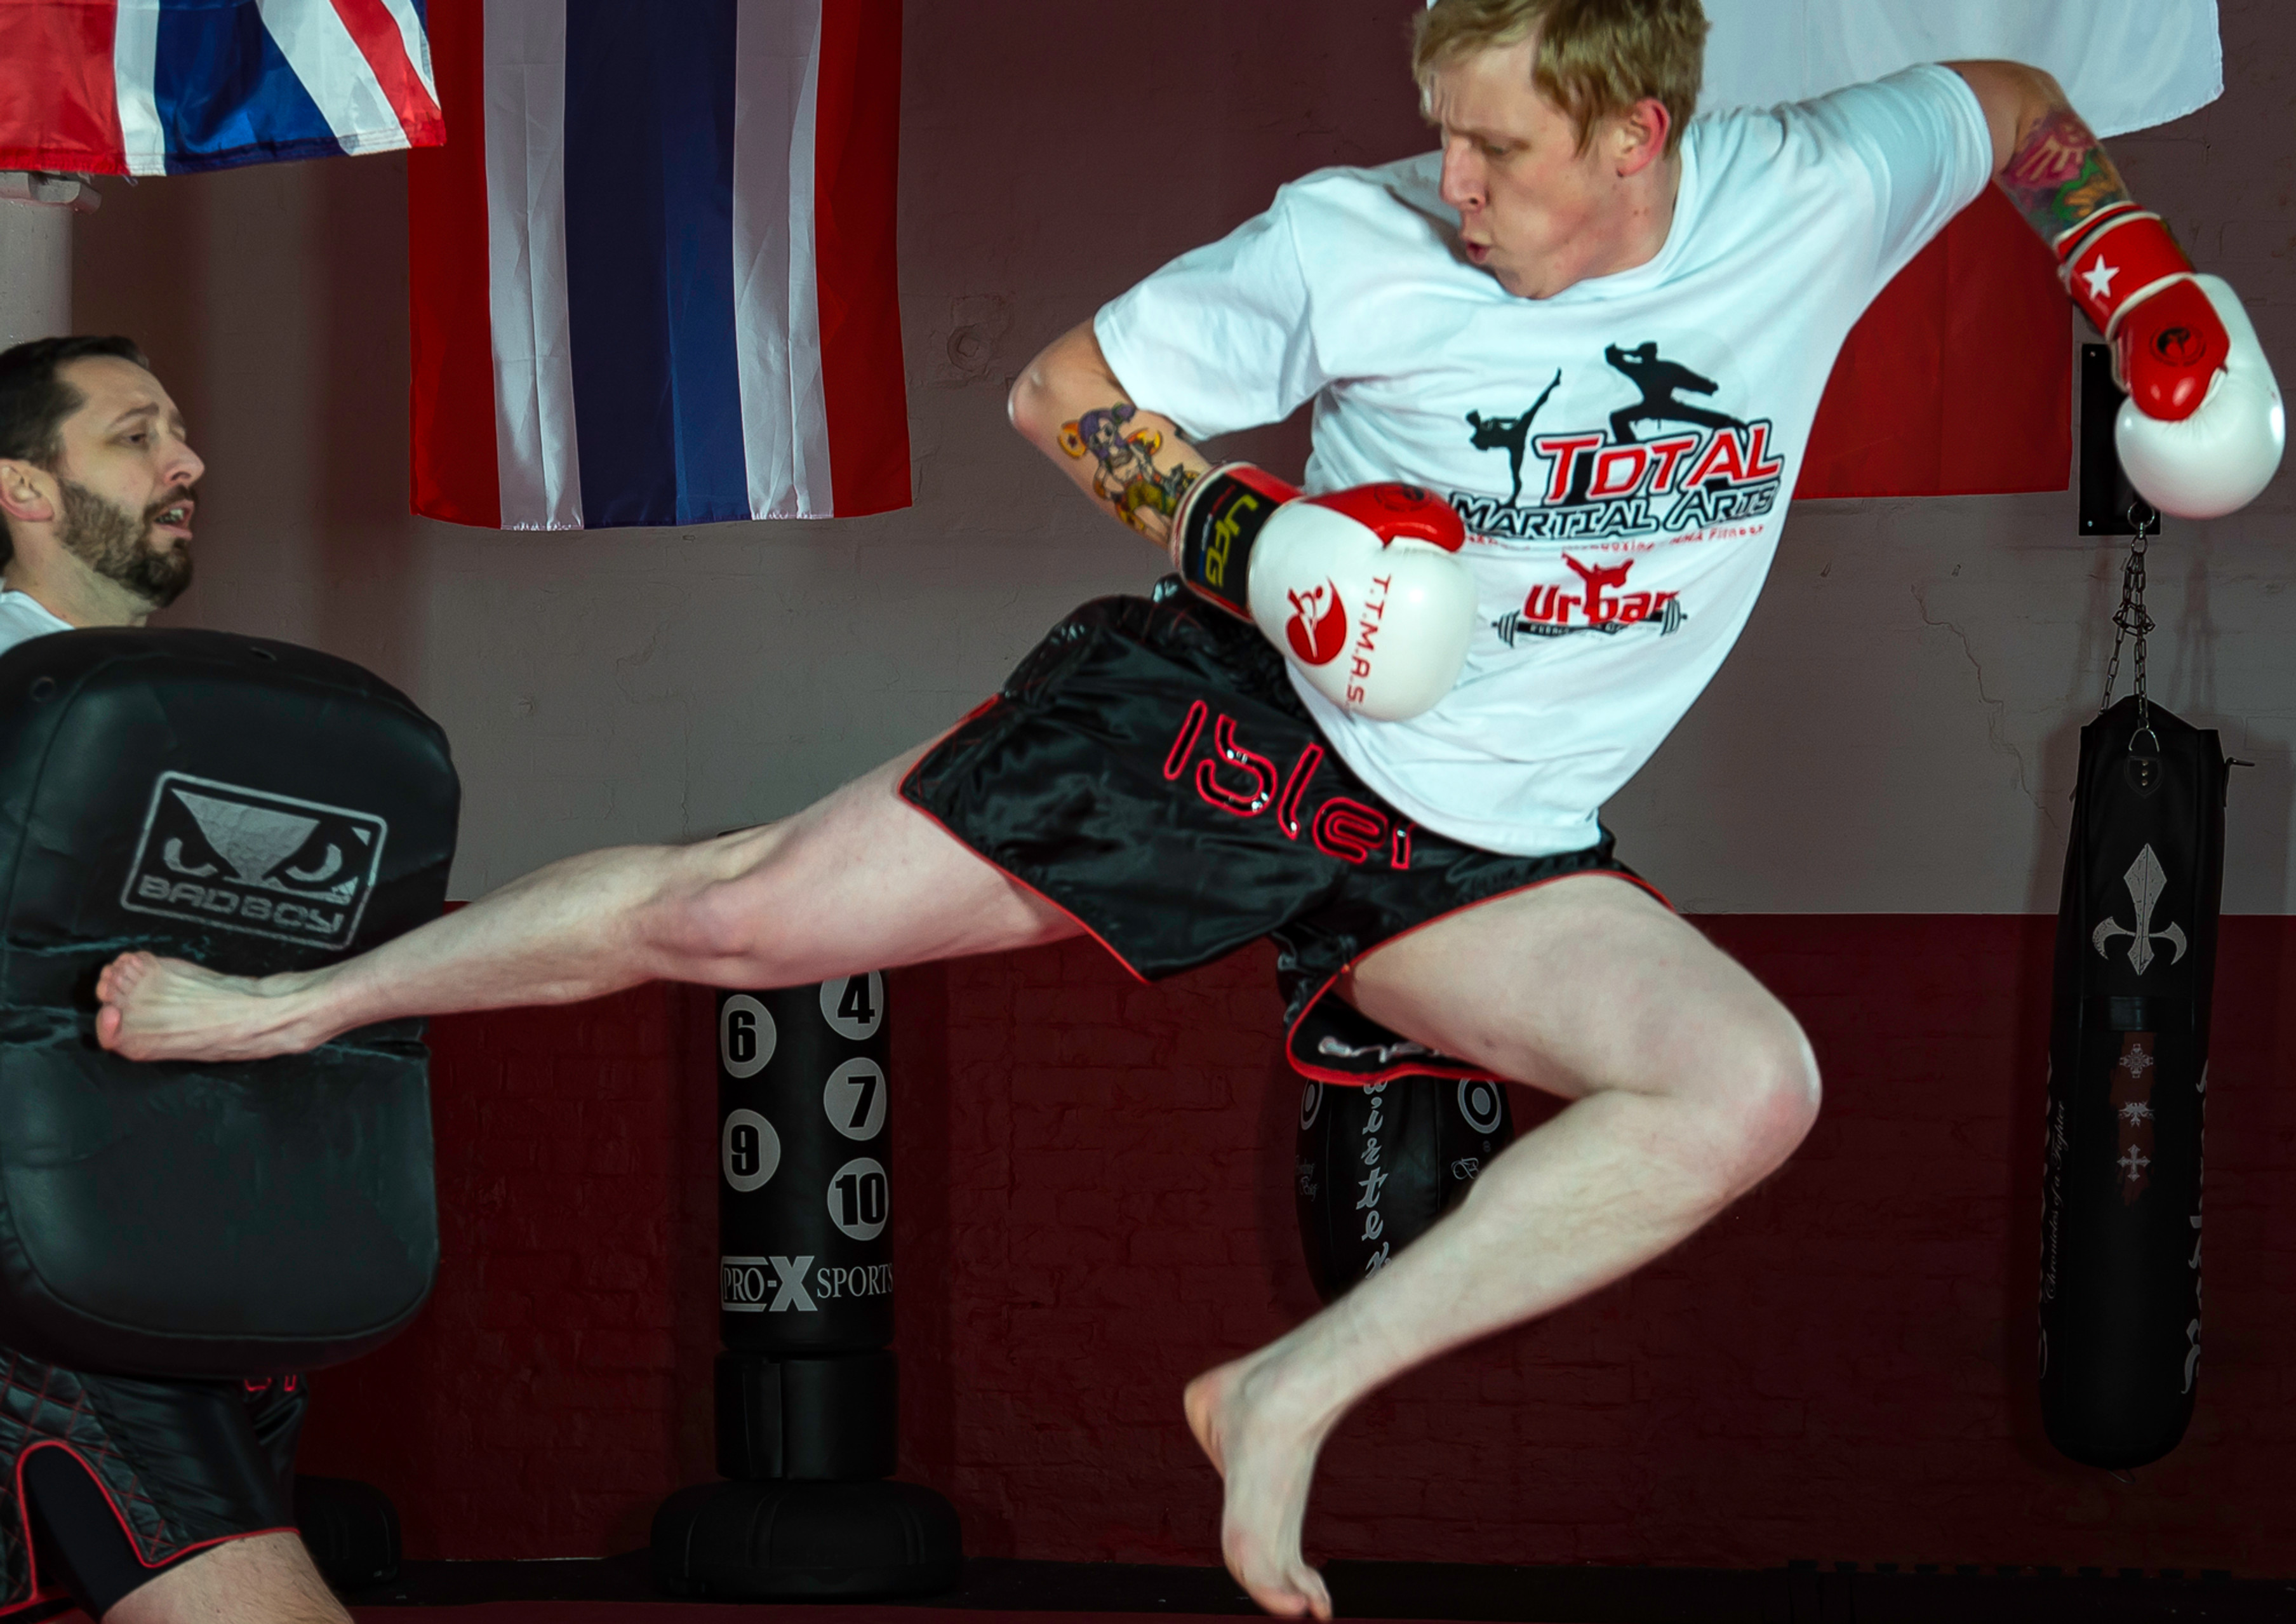 TMA Kickboxing - Sport & Self Defence